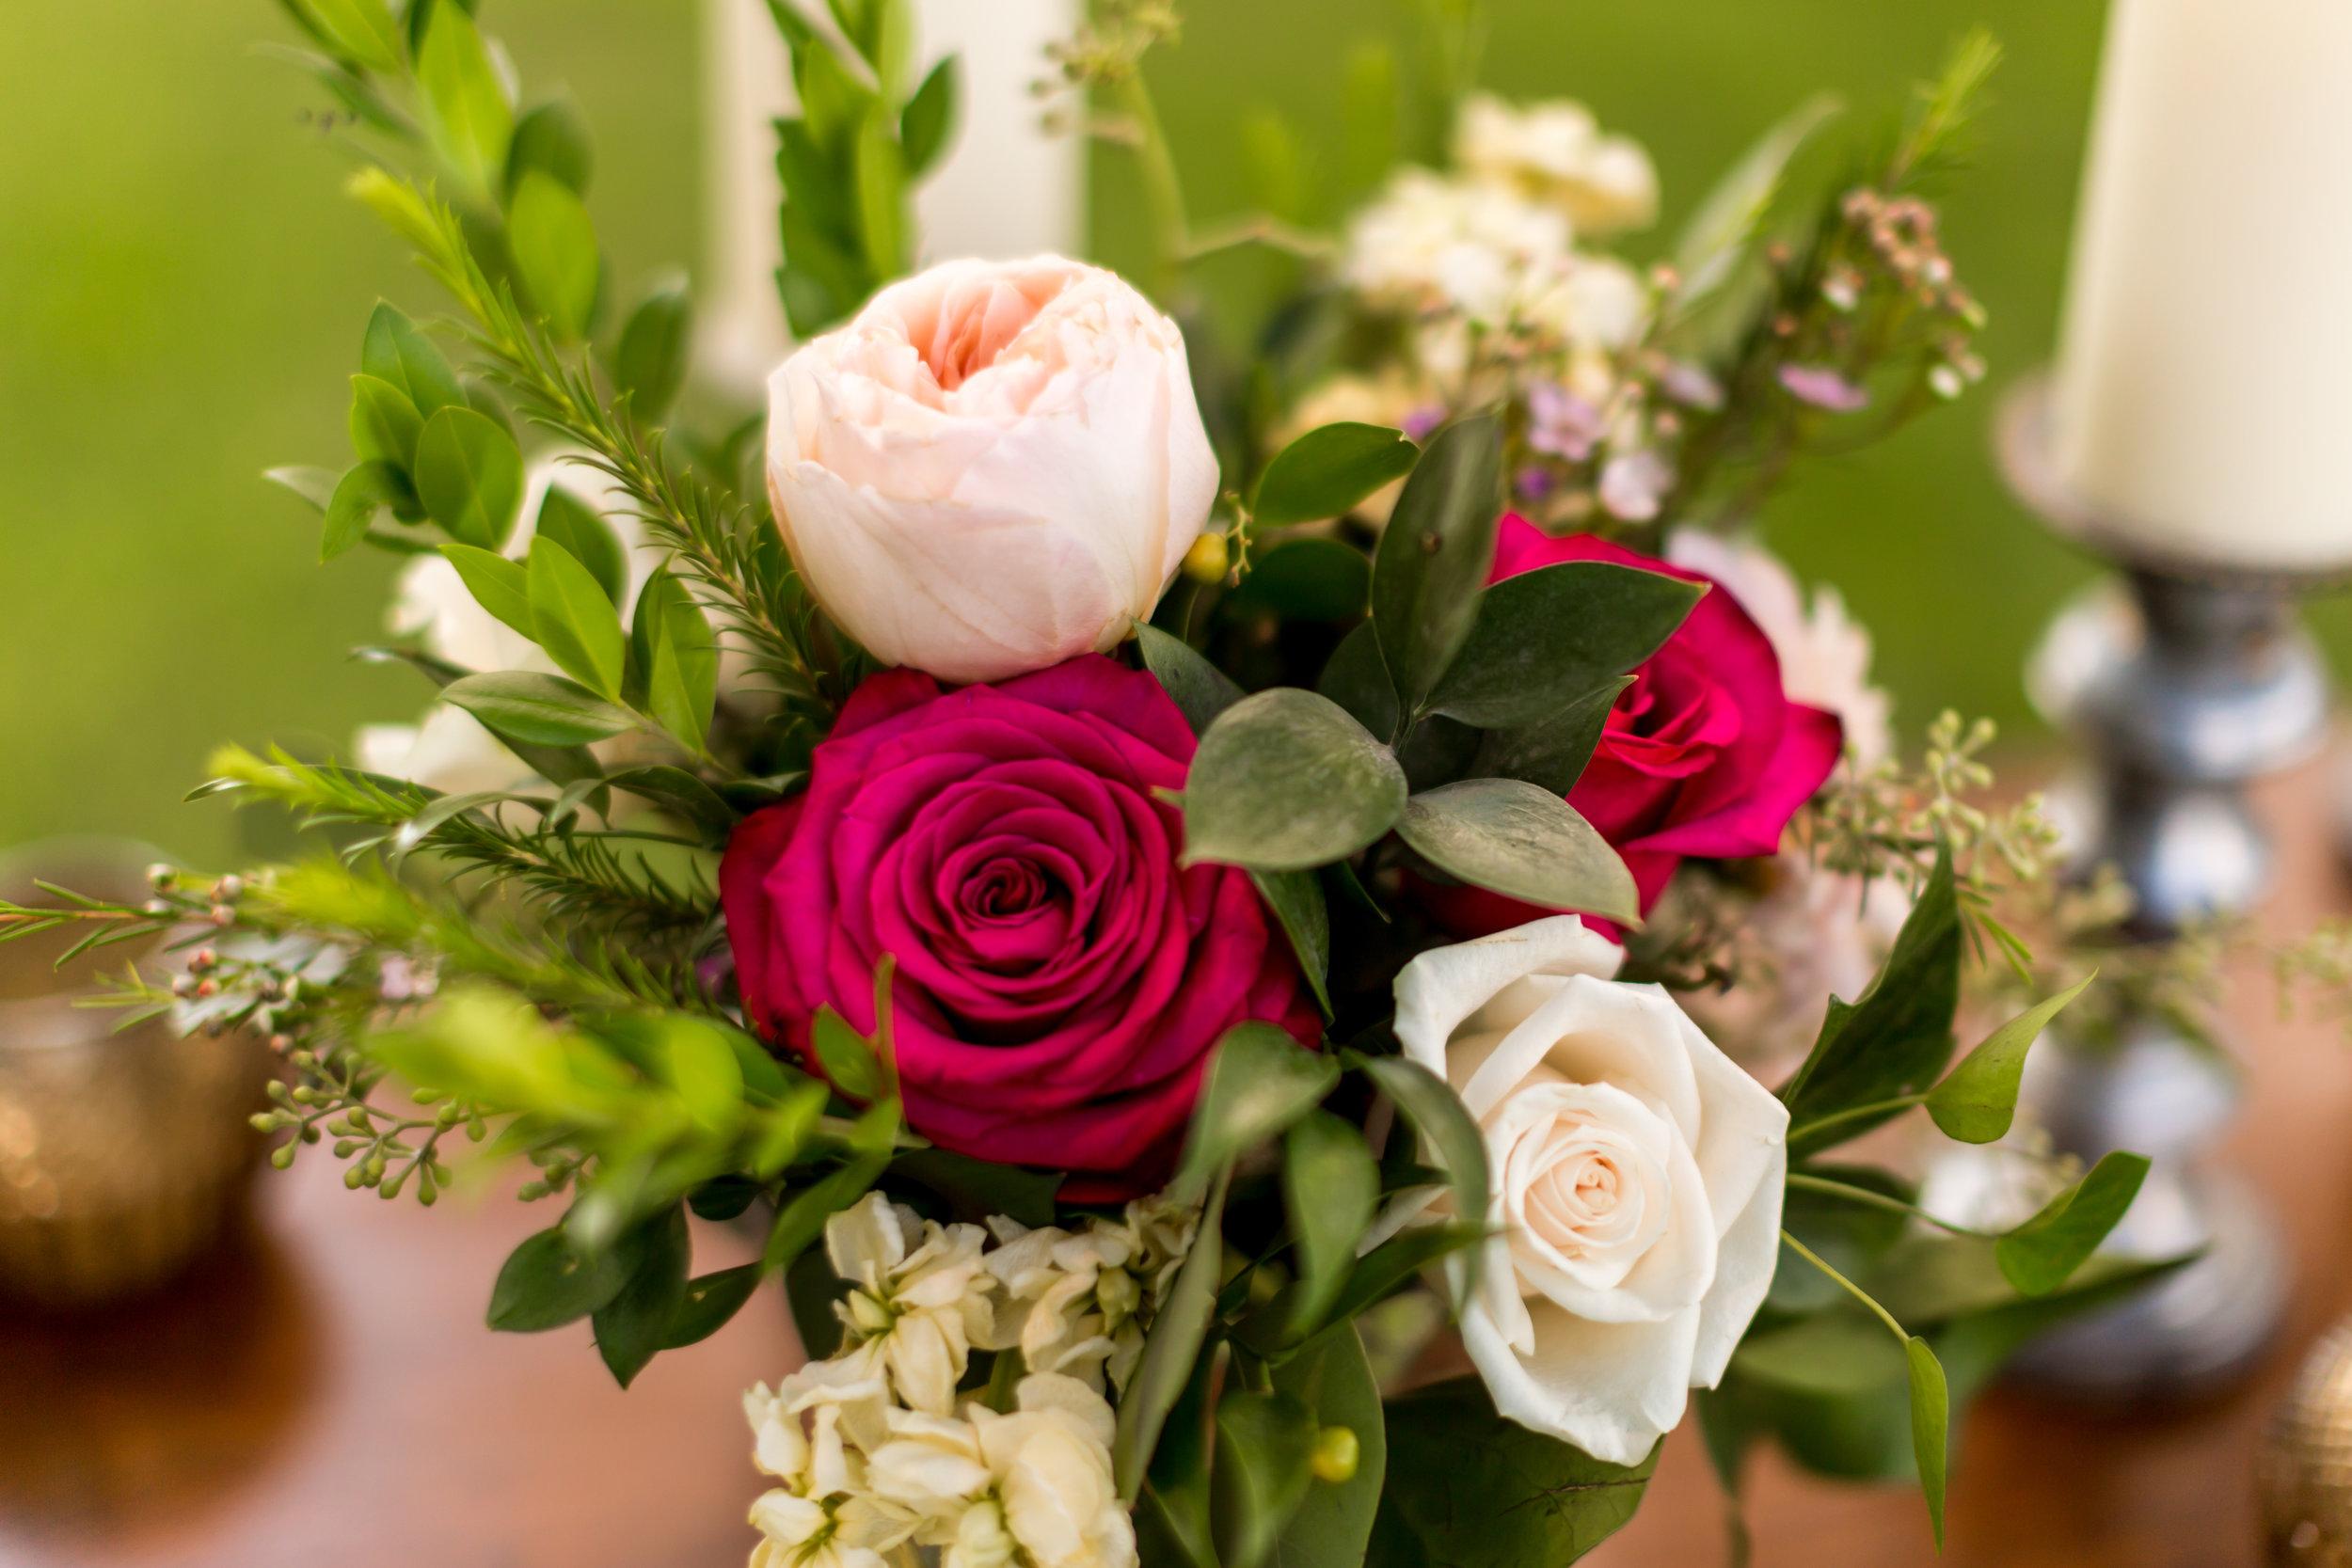 20160903_Roswold Wedding_0497.jpg